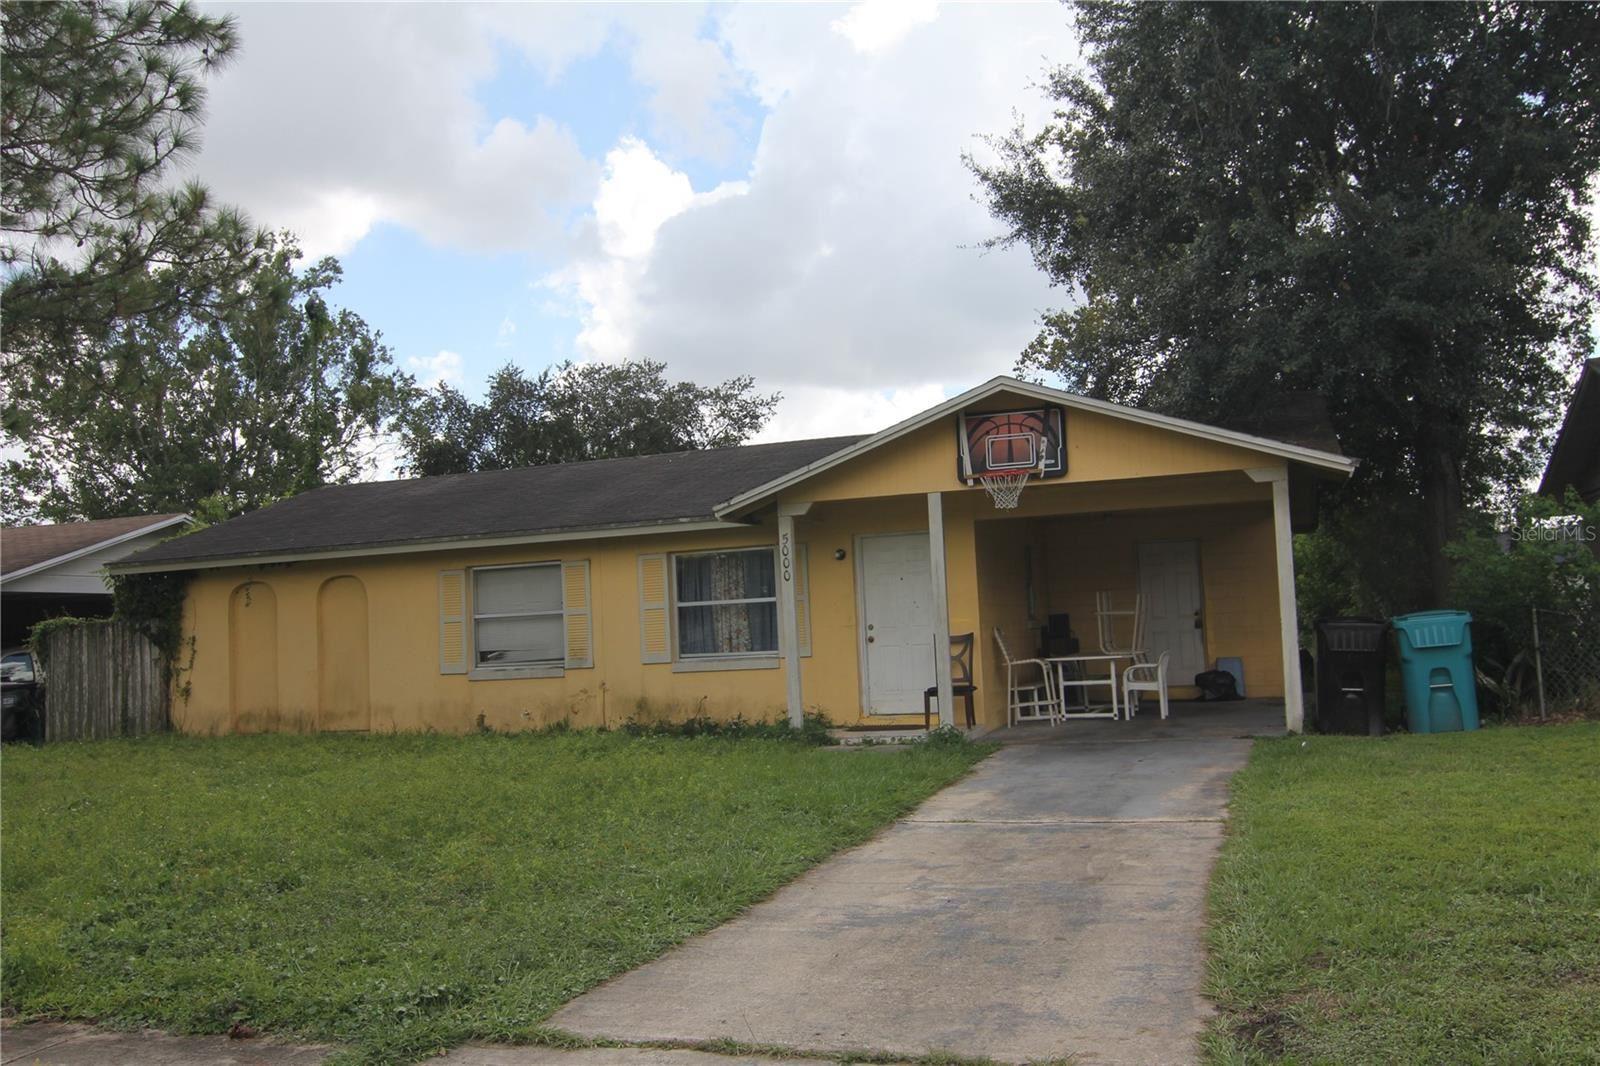 5000 LANETTE STREET, Orlando, FL 32811 - #: O5973857